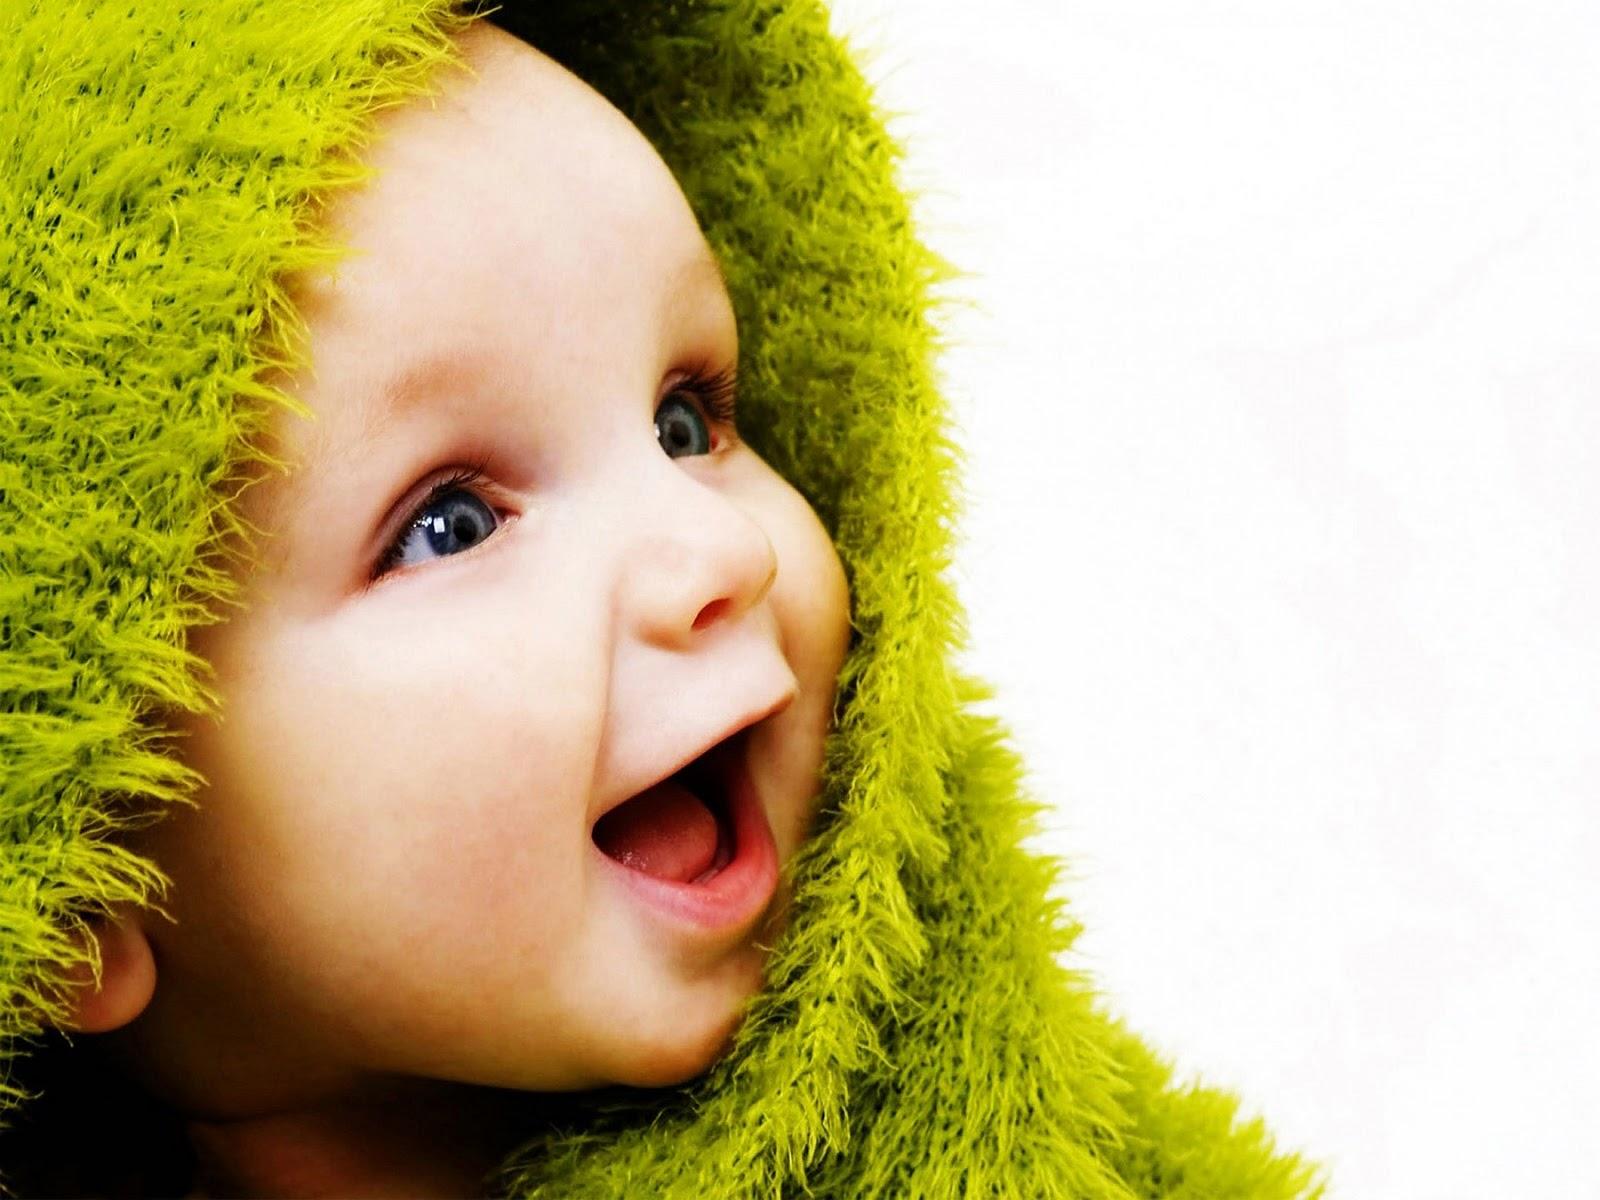 Best Desktop HD Wallpaper - Cute Baby Wallpapers